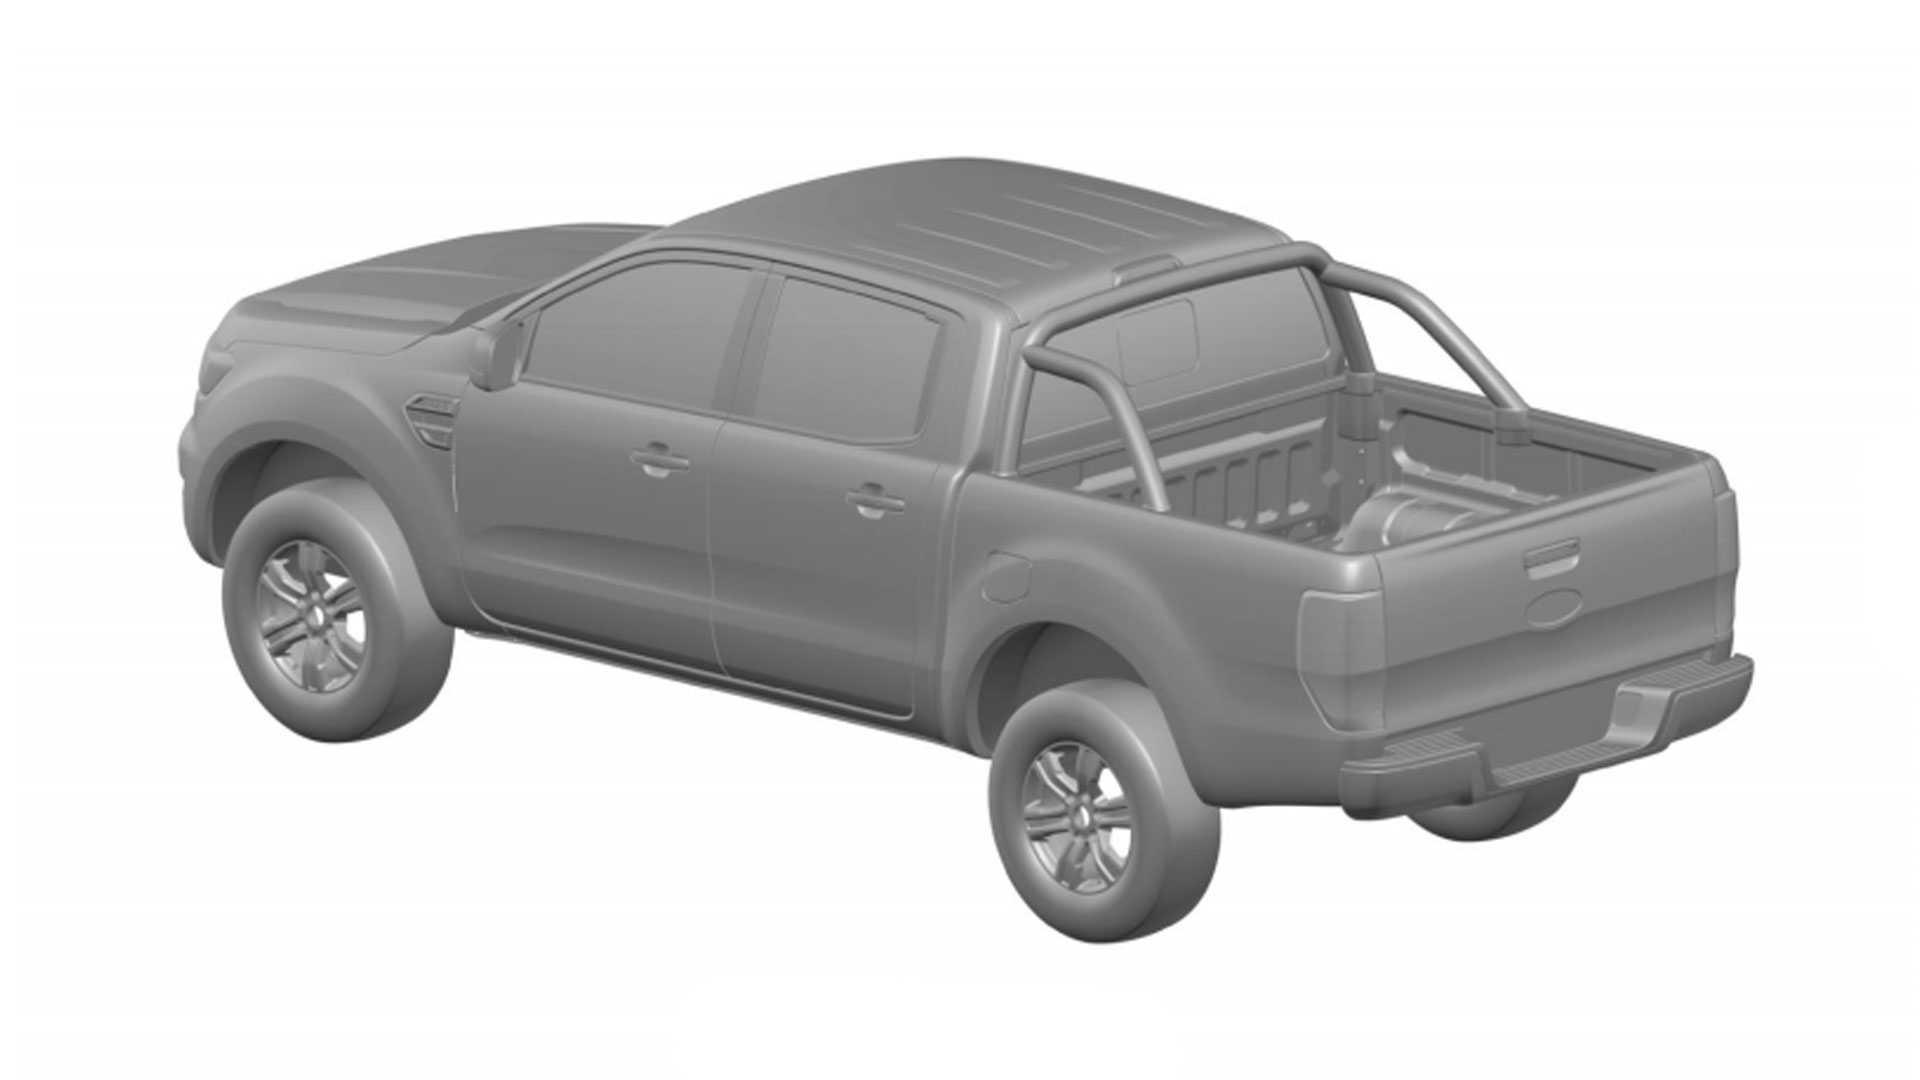 Ford Ranger Reestilizada Inpi 1